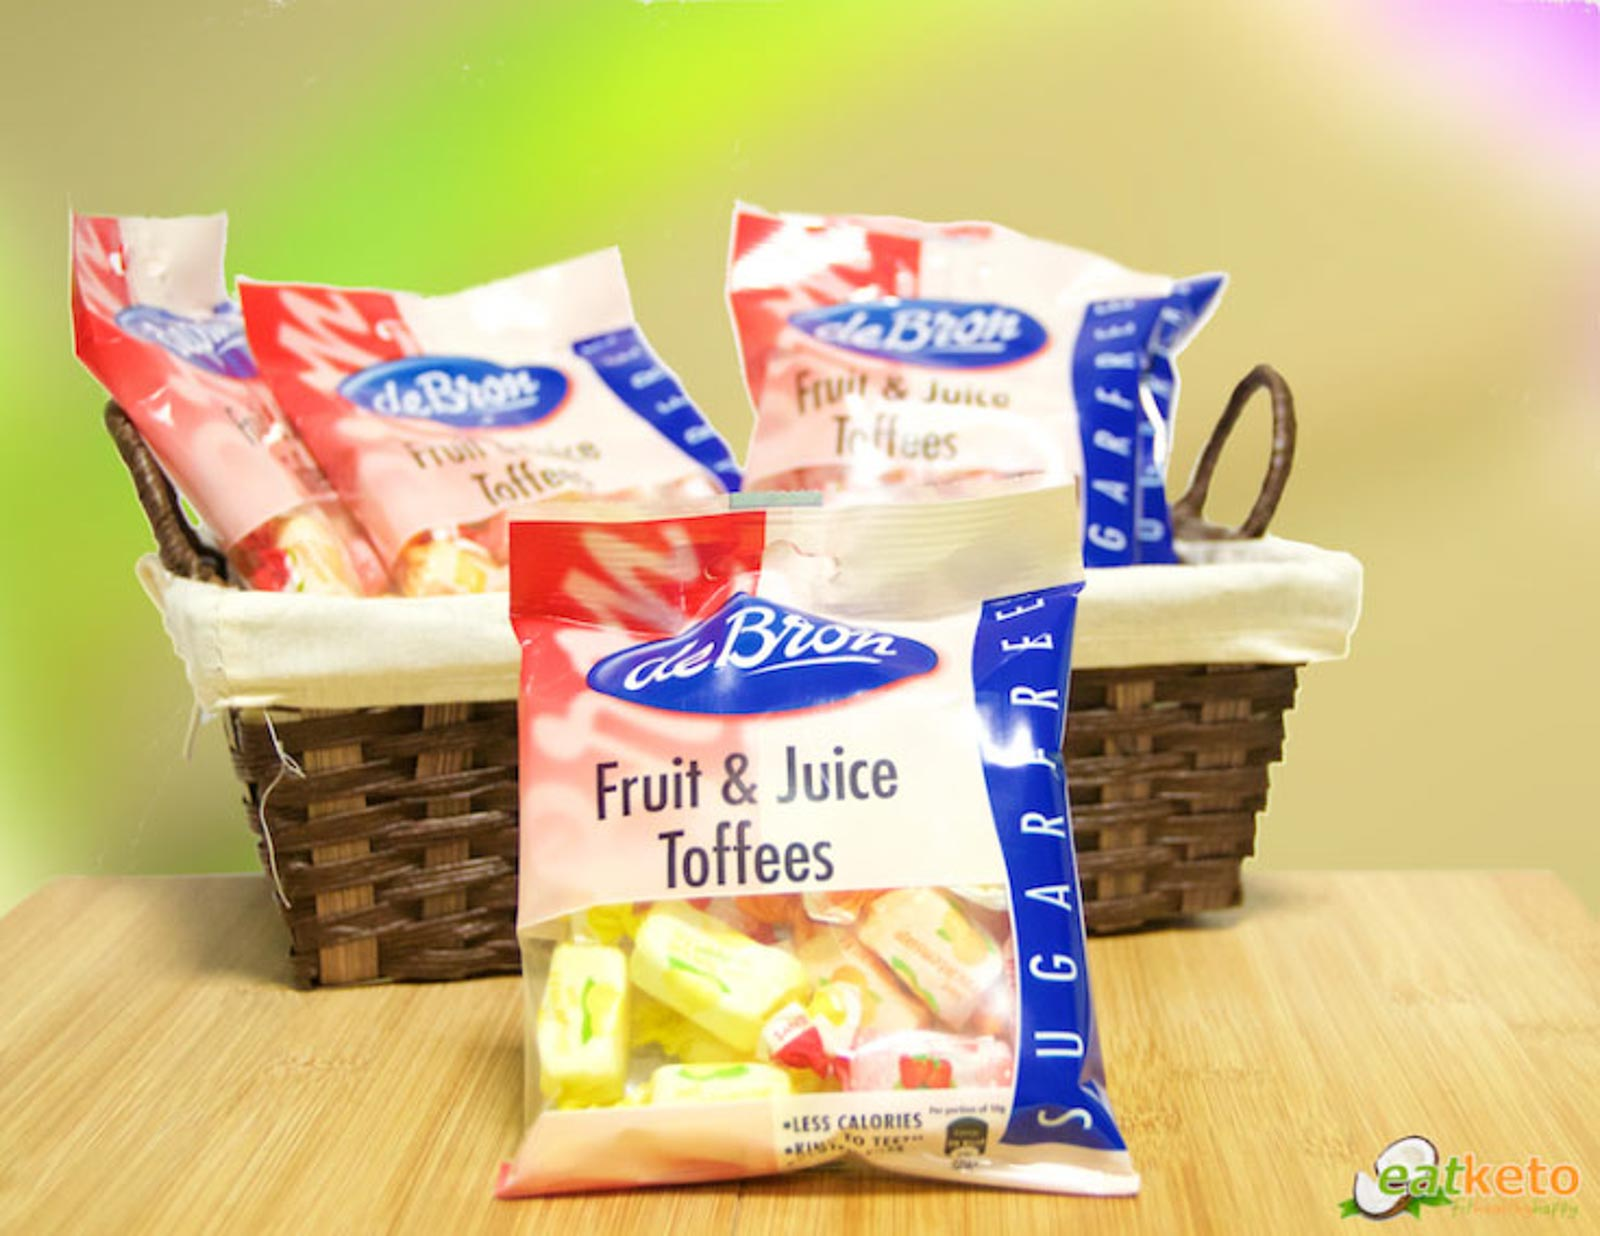 Produkttest: de Bron Fruit & Juice Toffees – von eatketo.de